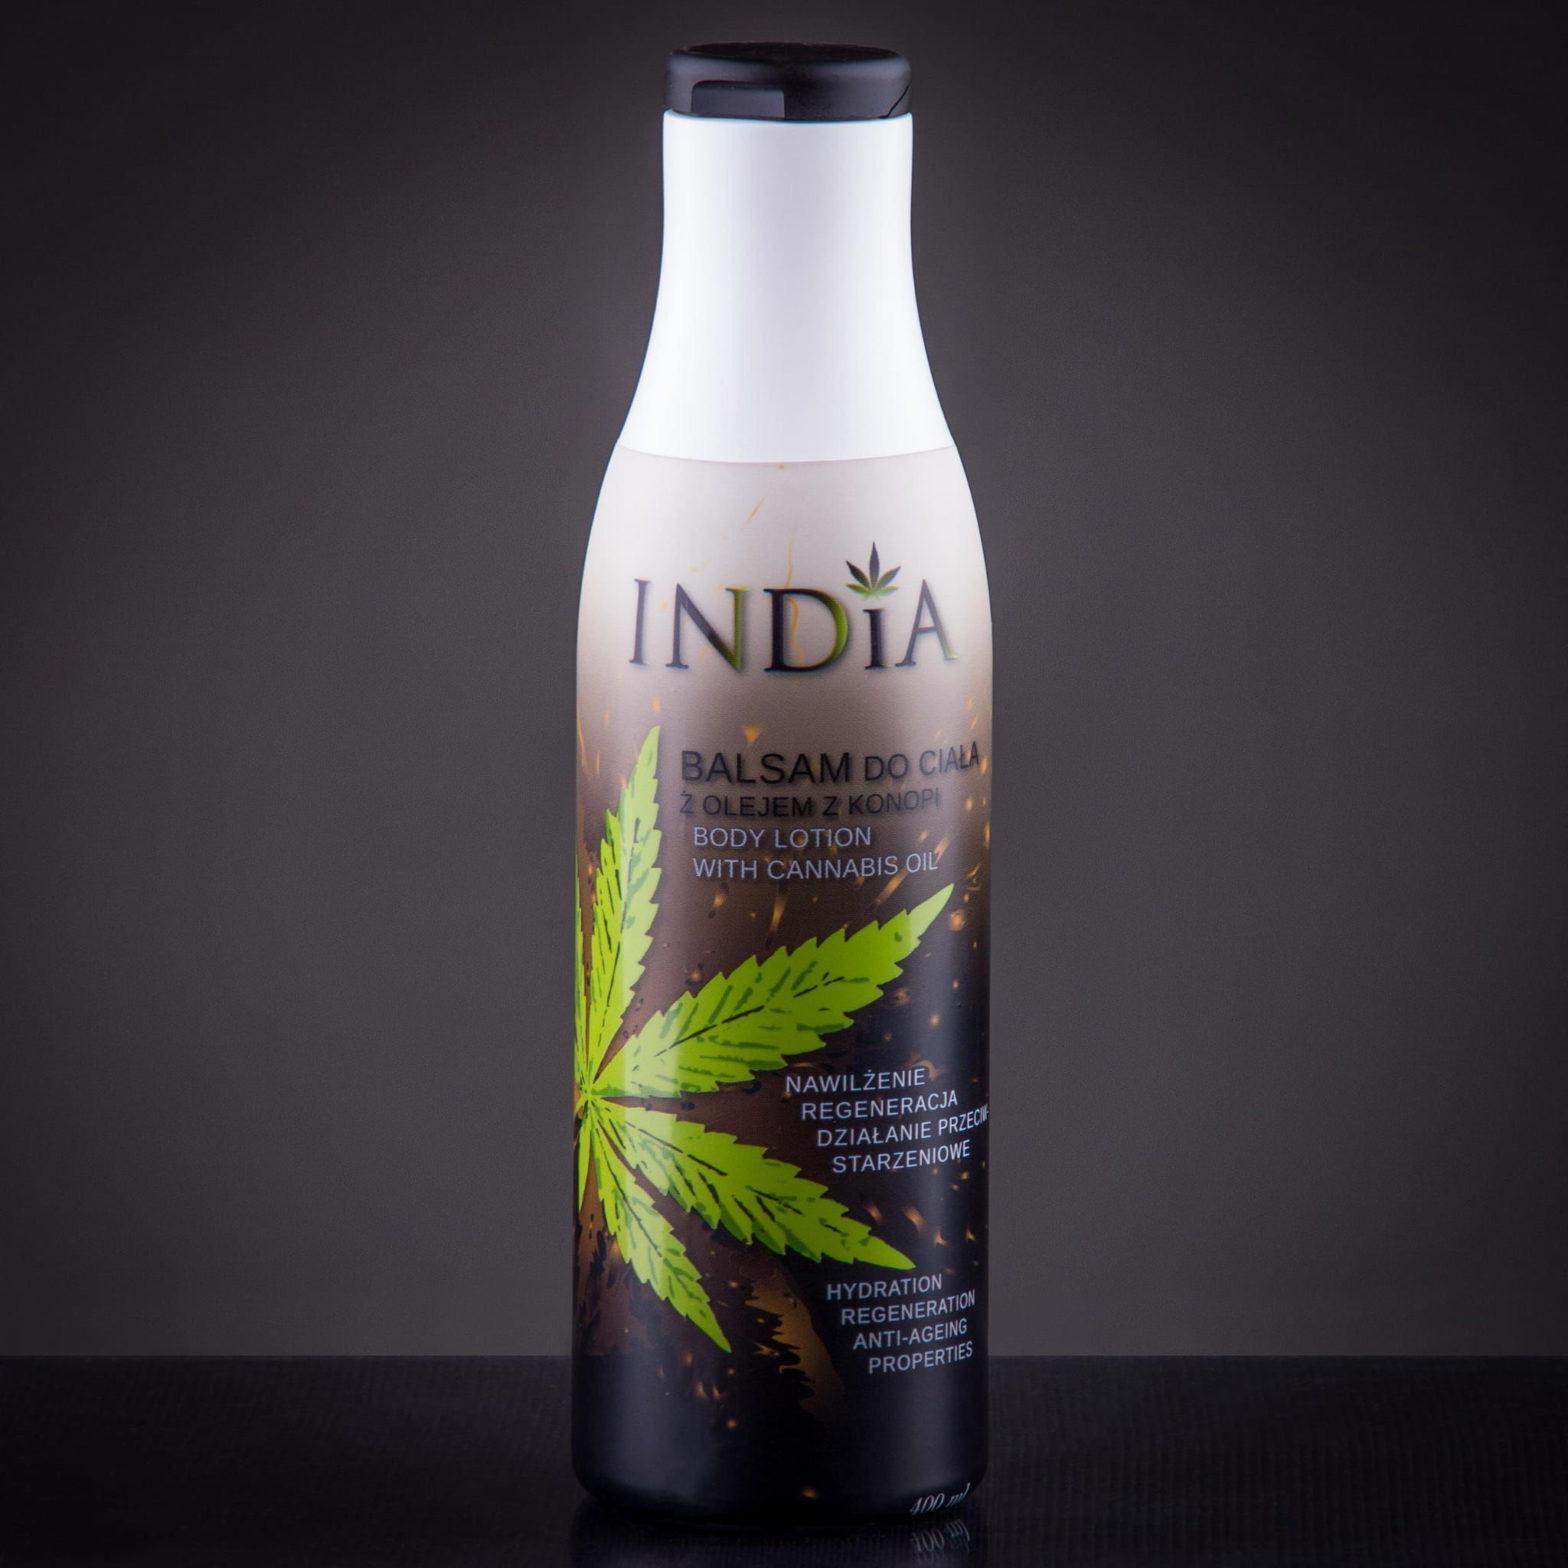 India Cosmetics Balsam konopny do ciała INDIA 400ml F7D2-62674